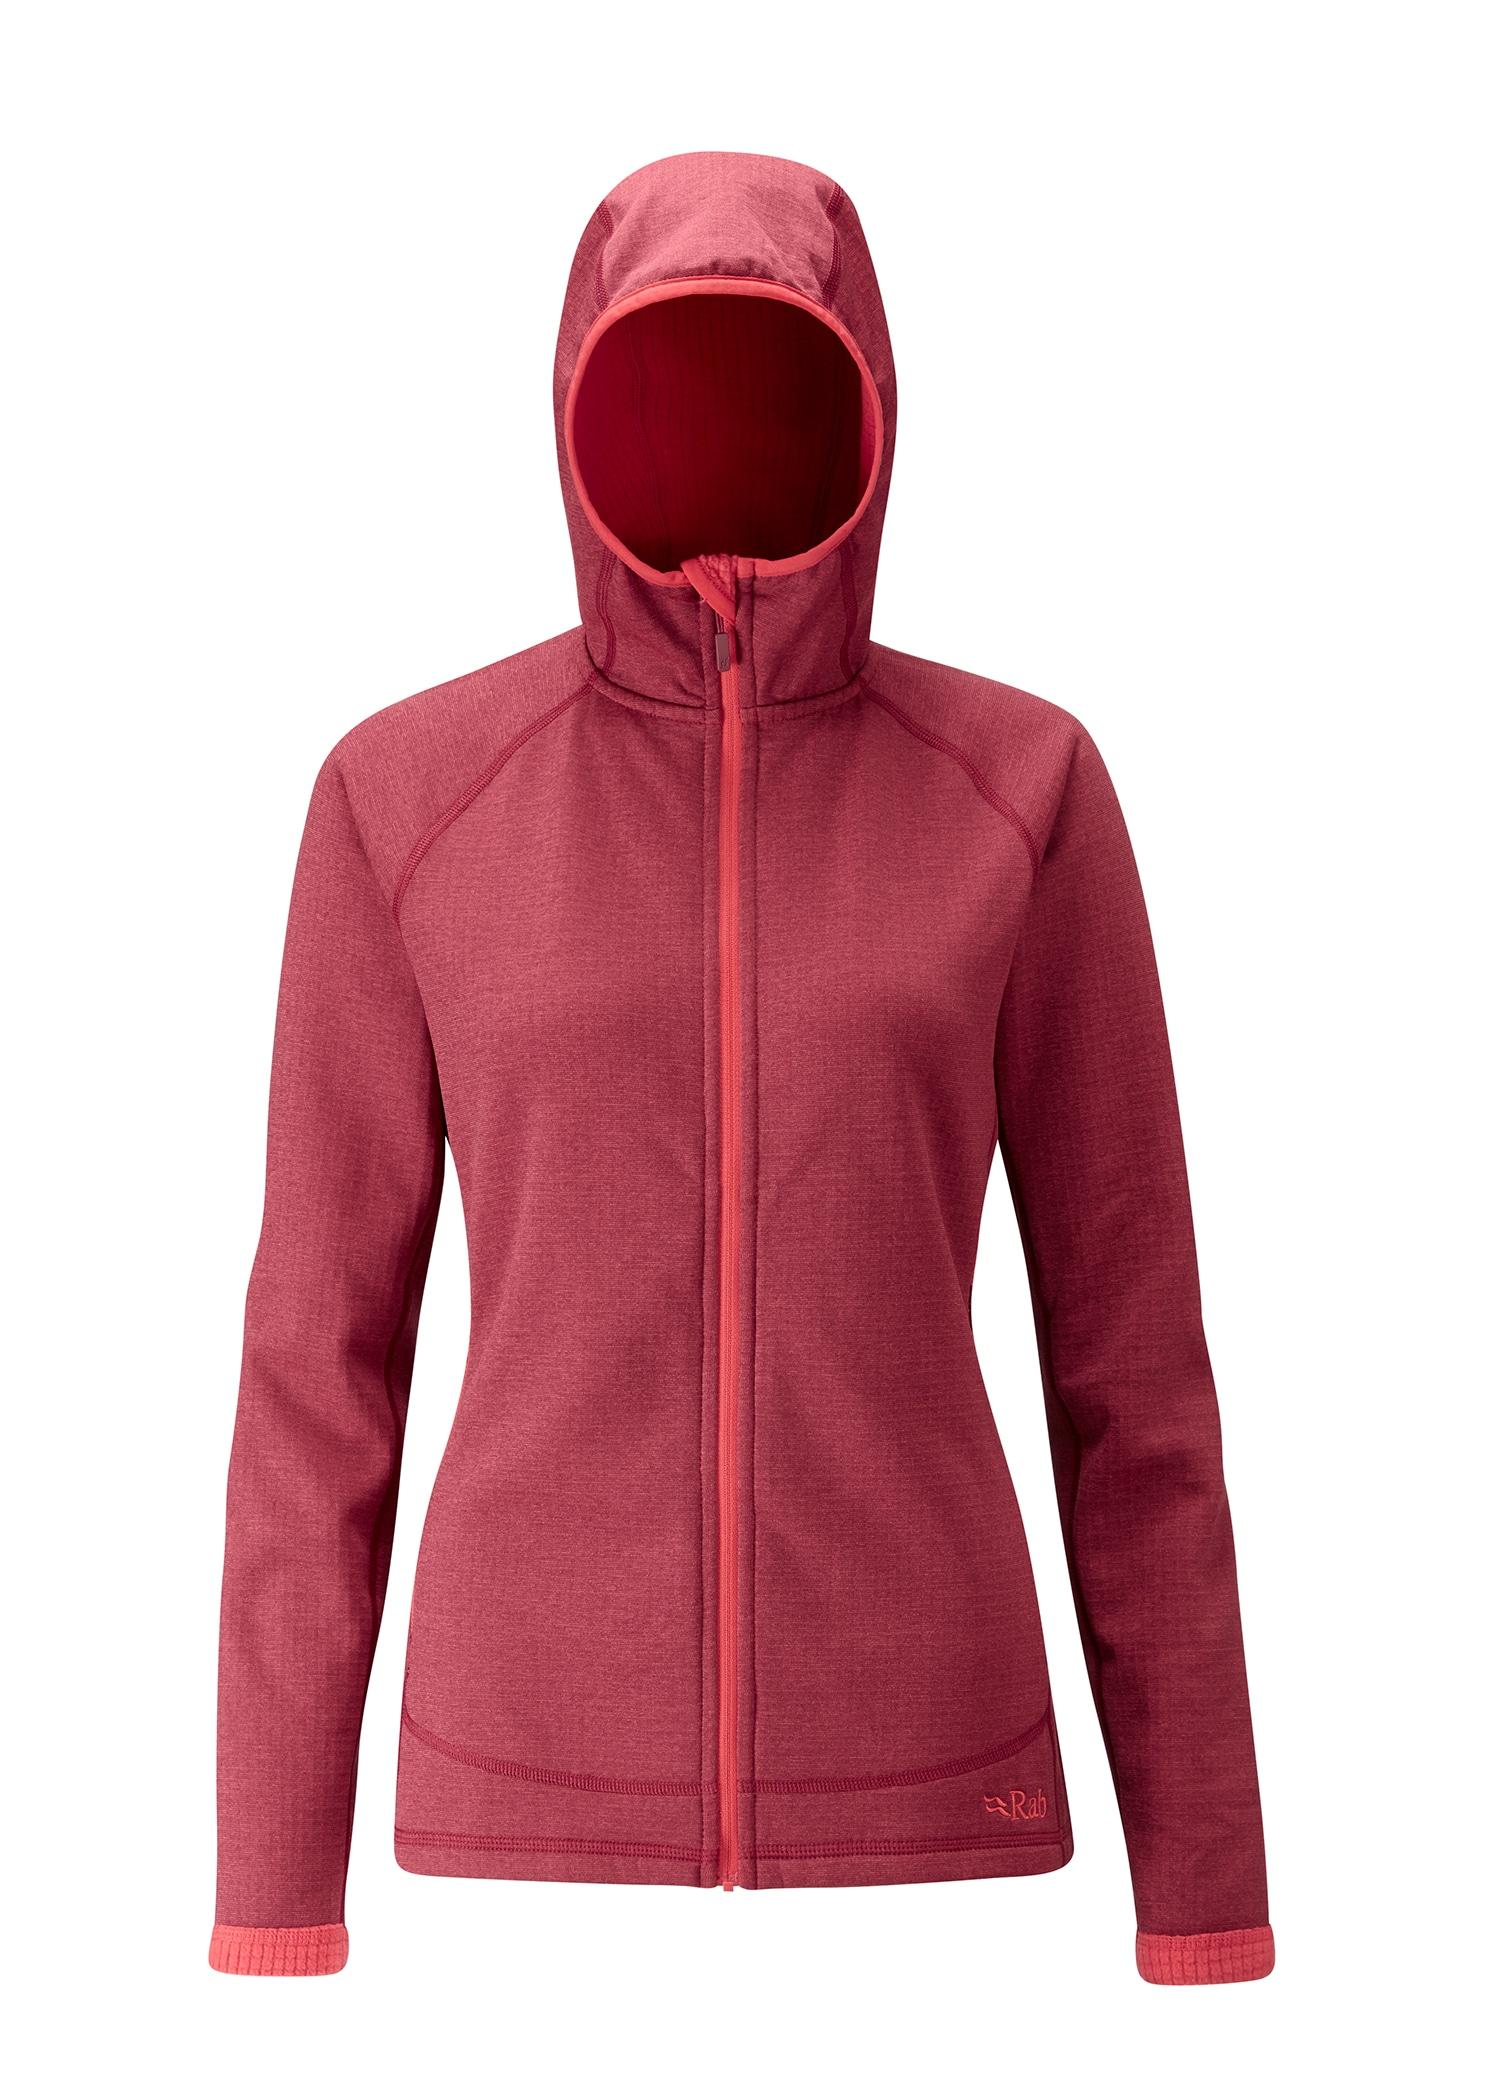 RAB Nucleus Hooded Jacket W's